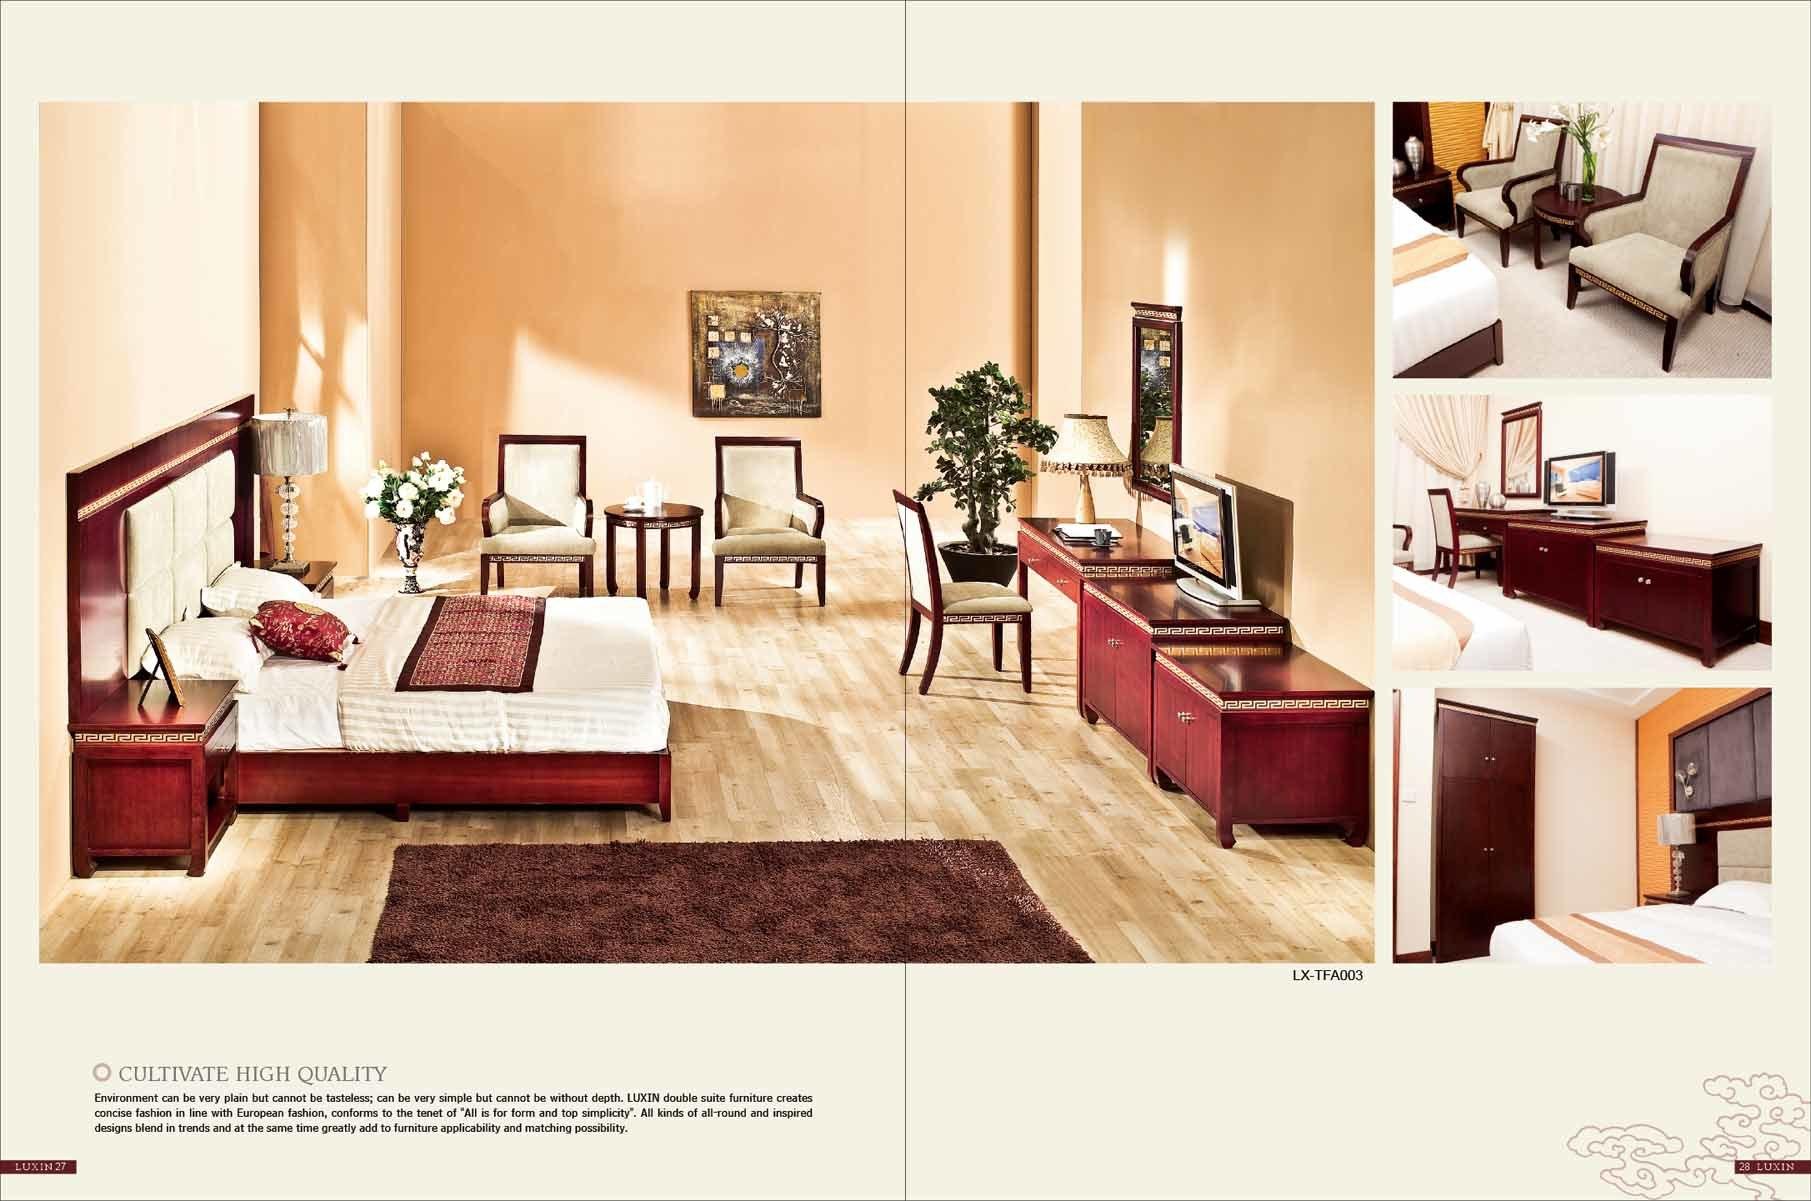 Top Hotel Bedroom Furniture Set for 5 Star Hotel Room (LX-TFA003) 1811 x 1201 · 178 kB · jpeg